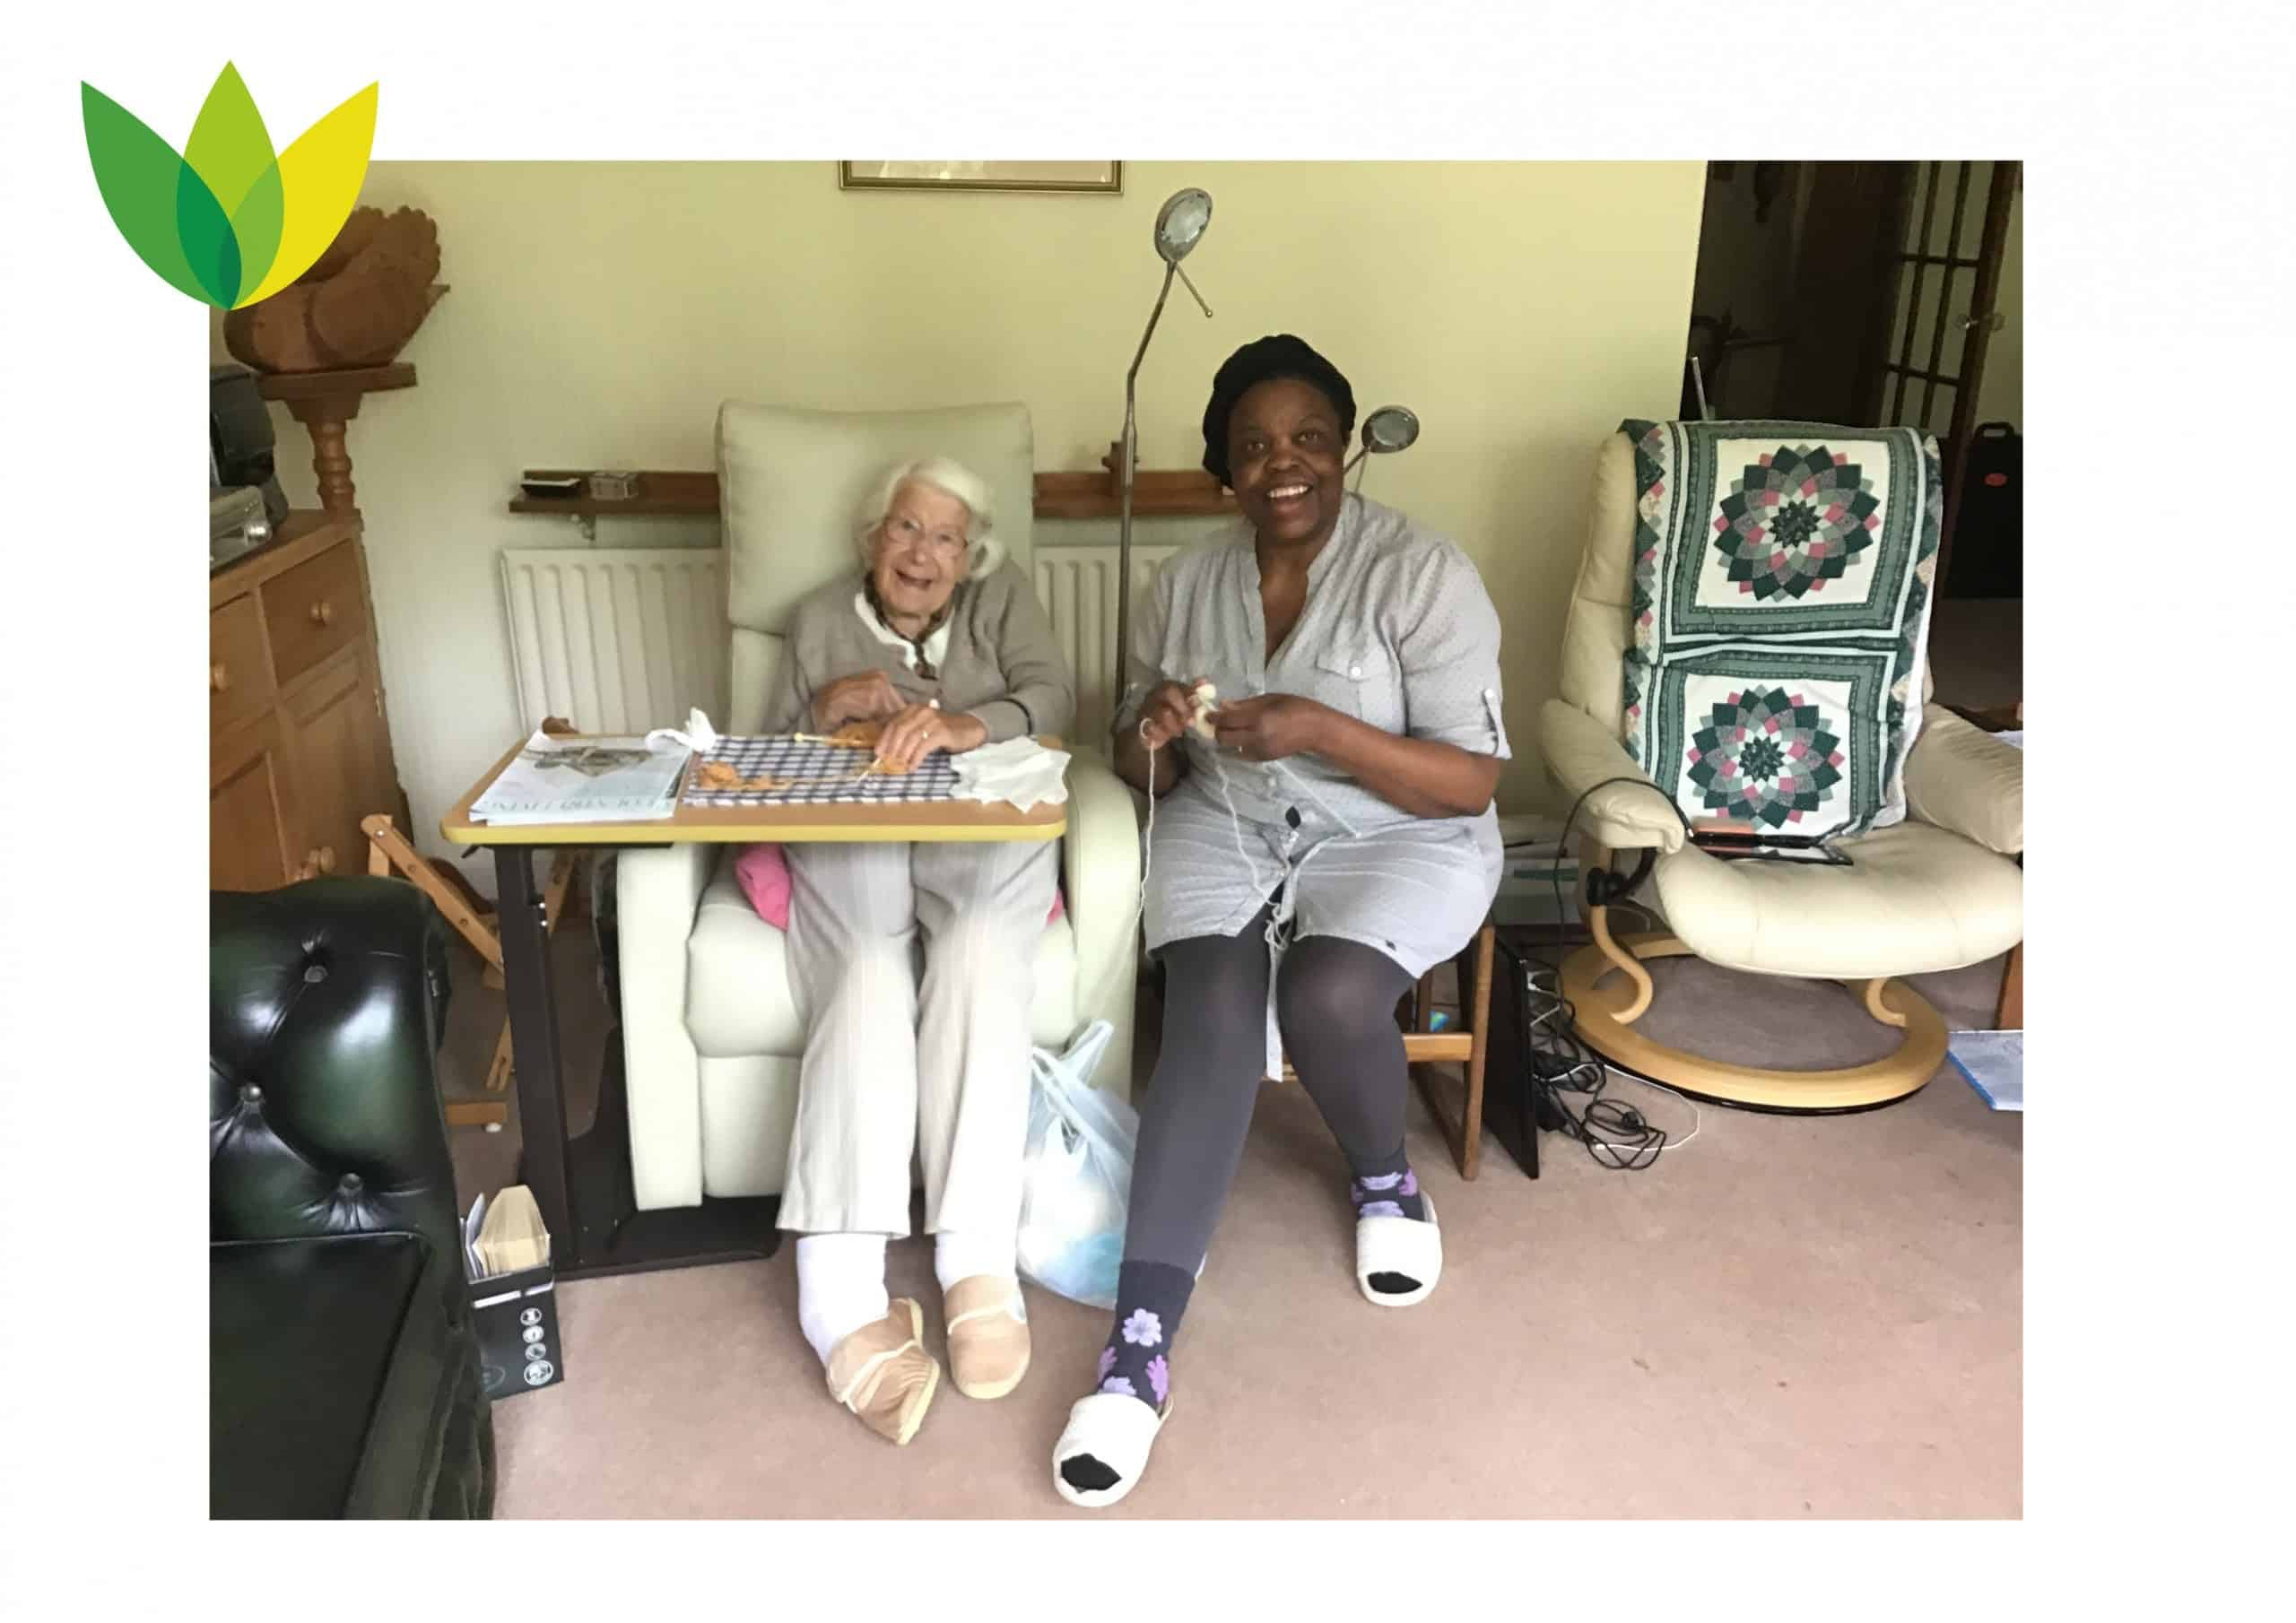 Elderly Lady and Carer Knitting